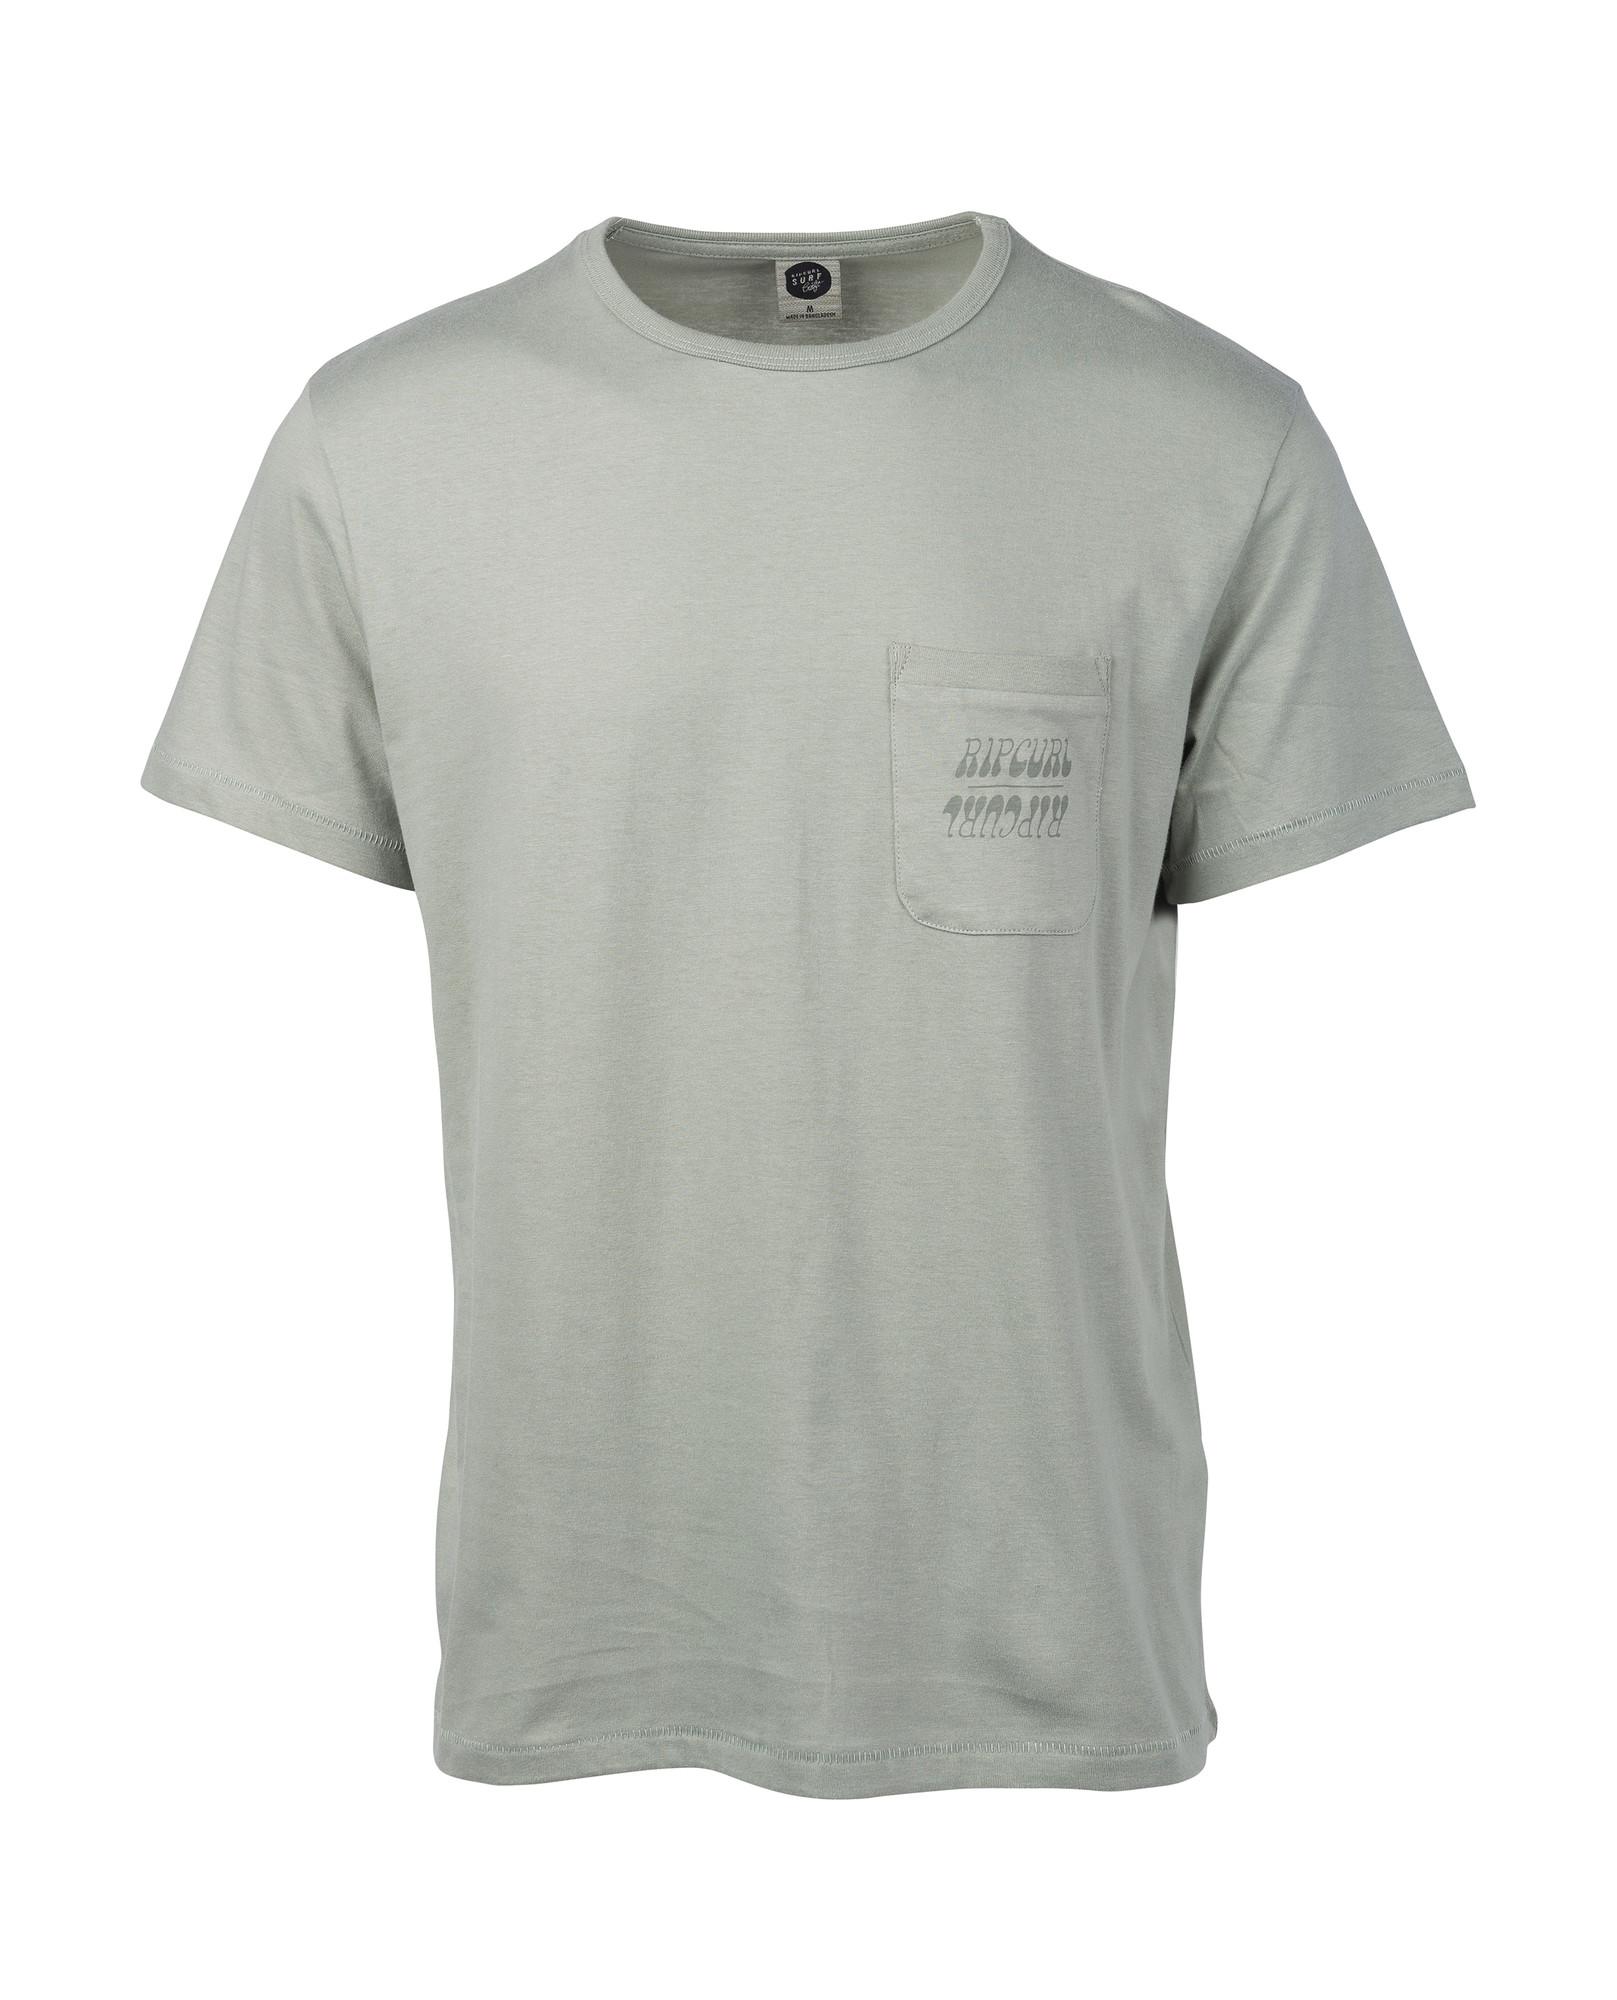 c17f06526 ORGANIC PLAIN POCKET T-Shirt 2019 light green | Warehouse One